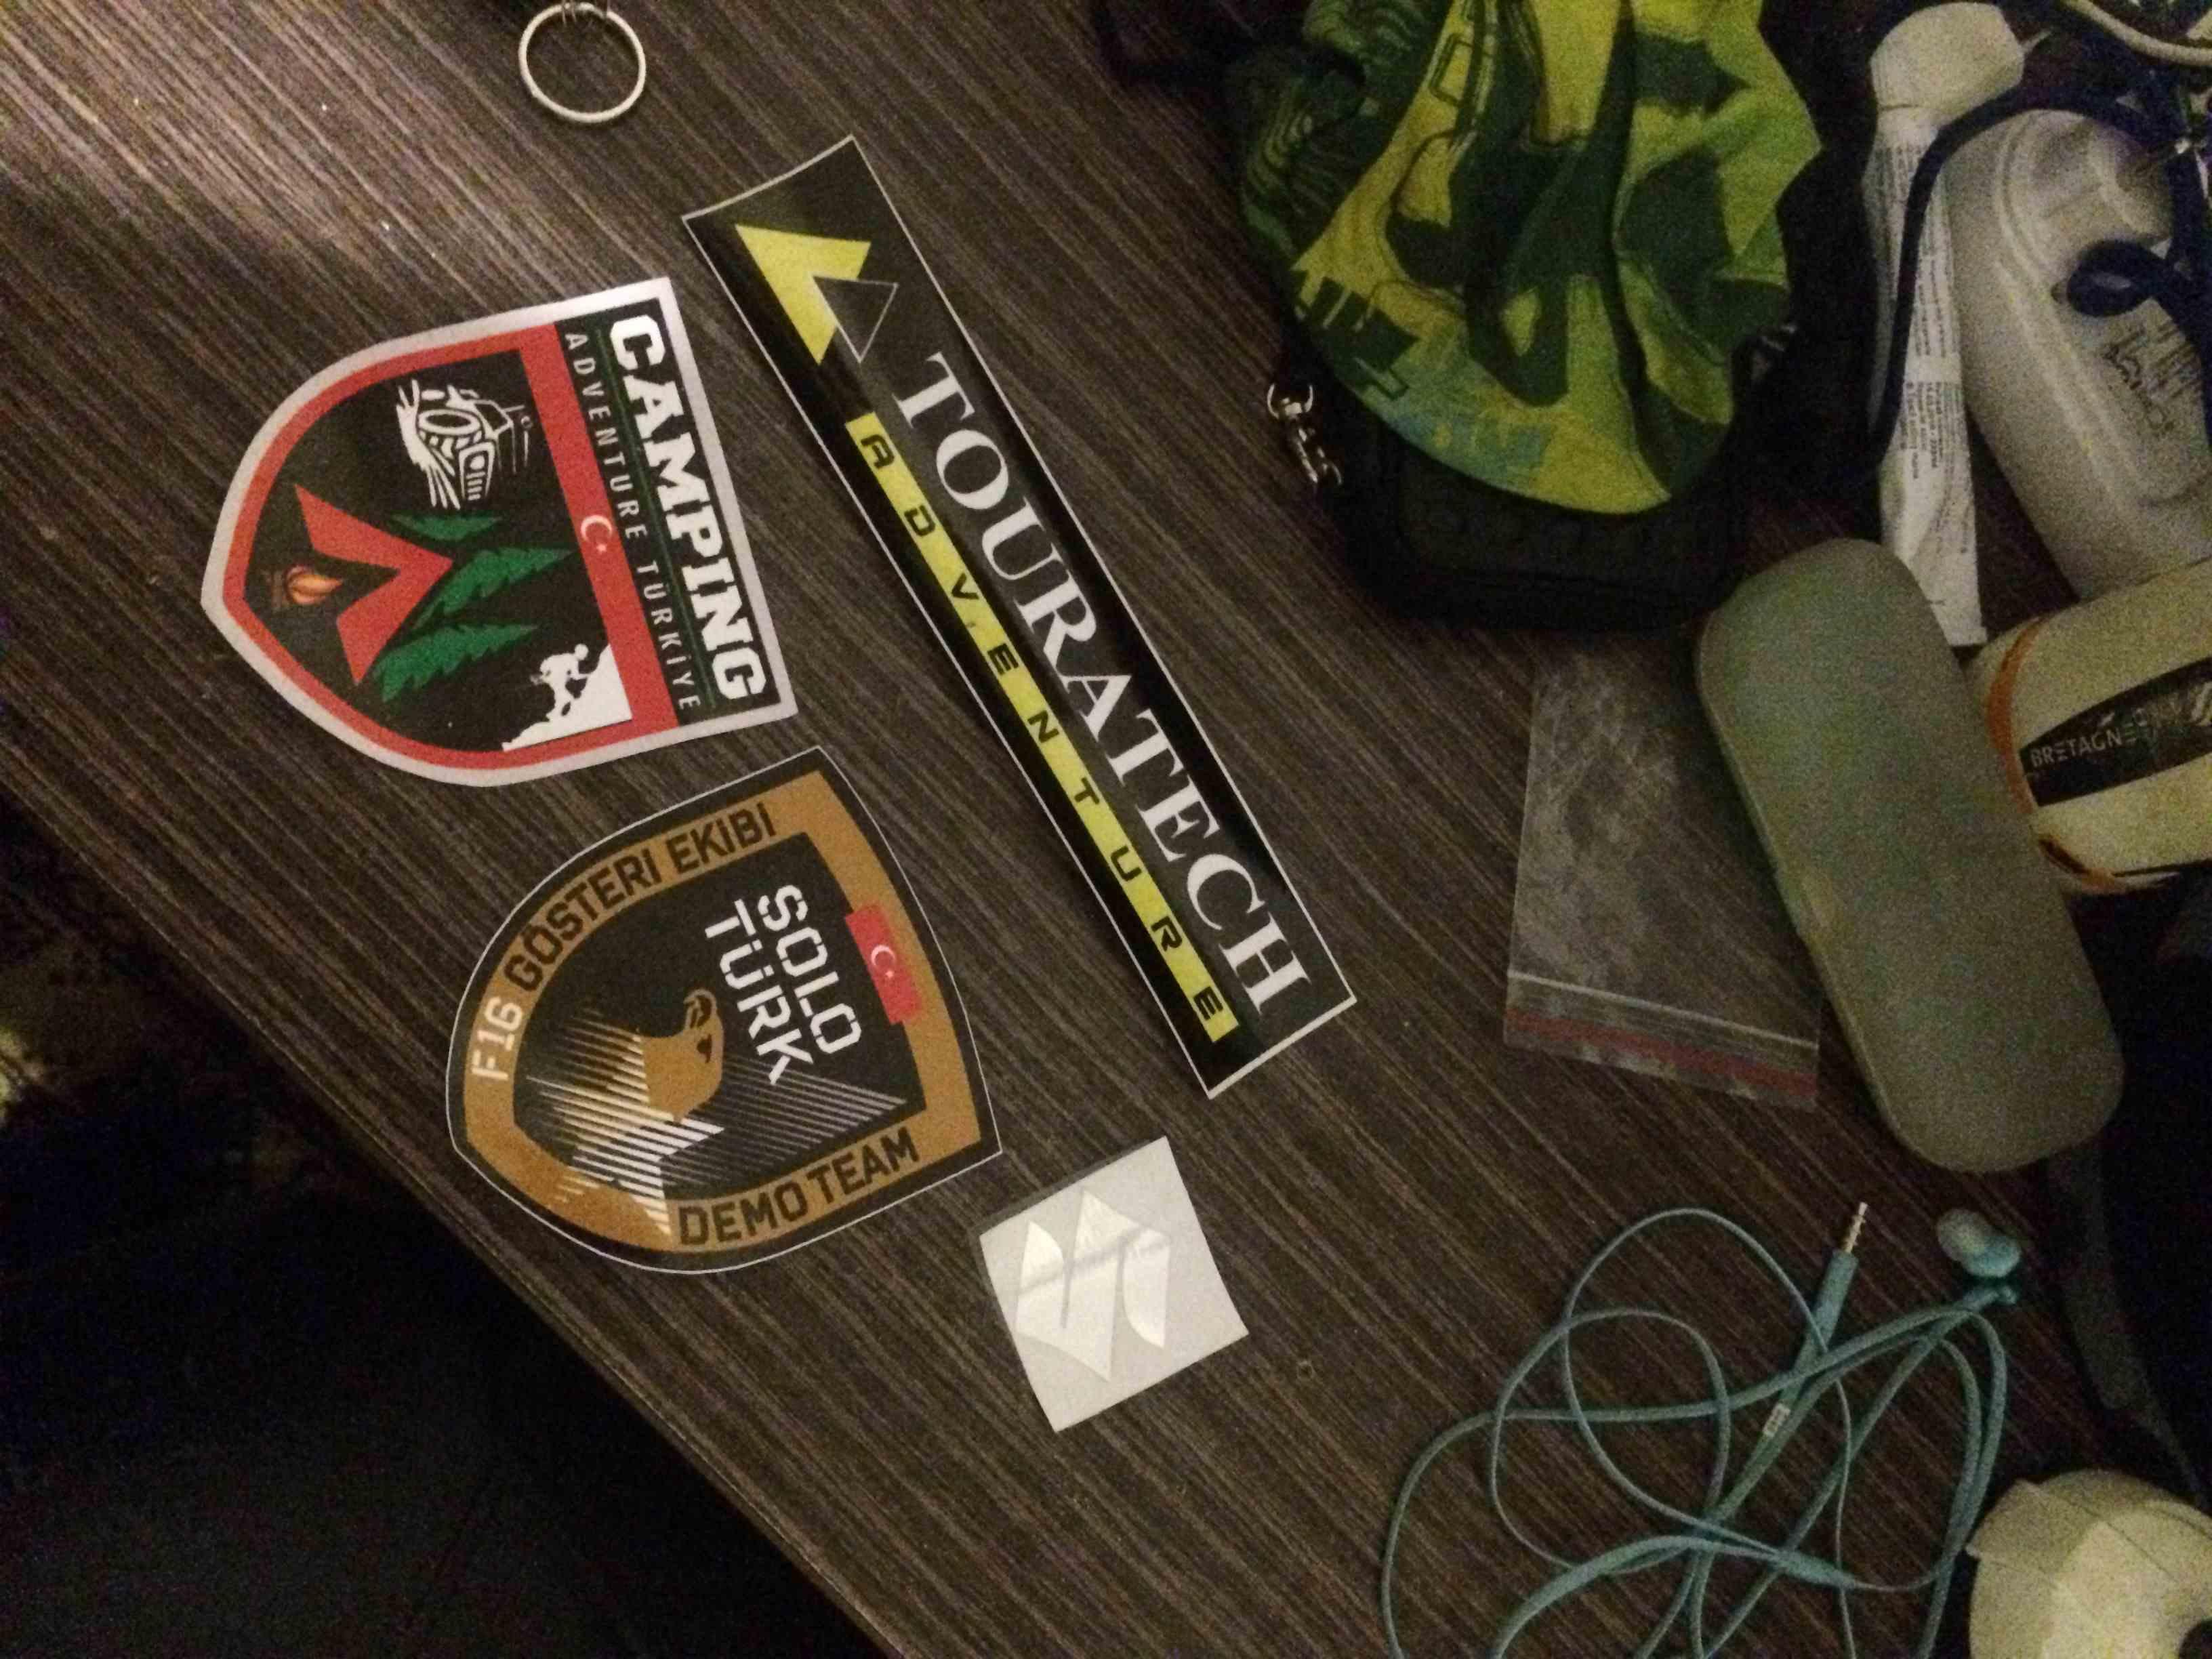 Atakan Demirtürk V-strom dl650 Sticker uygulaması